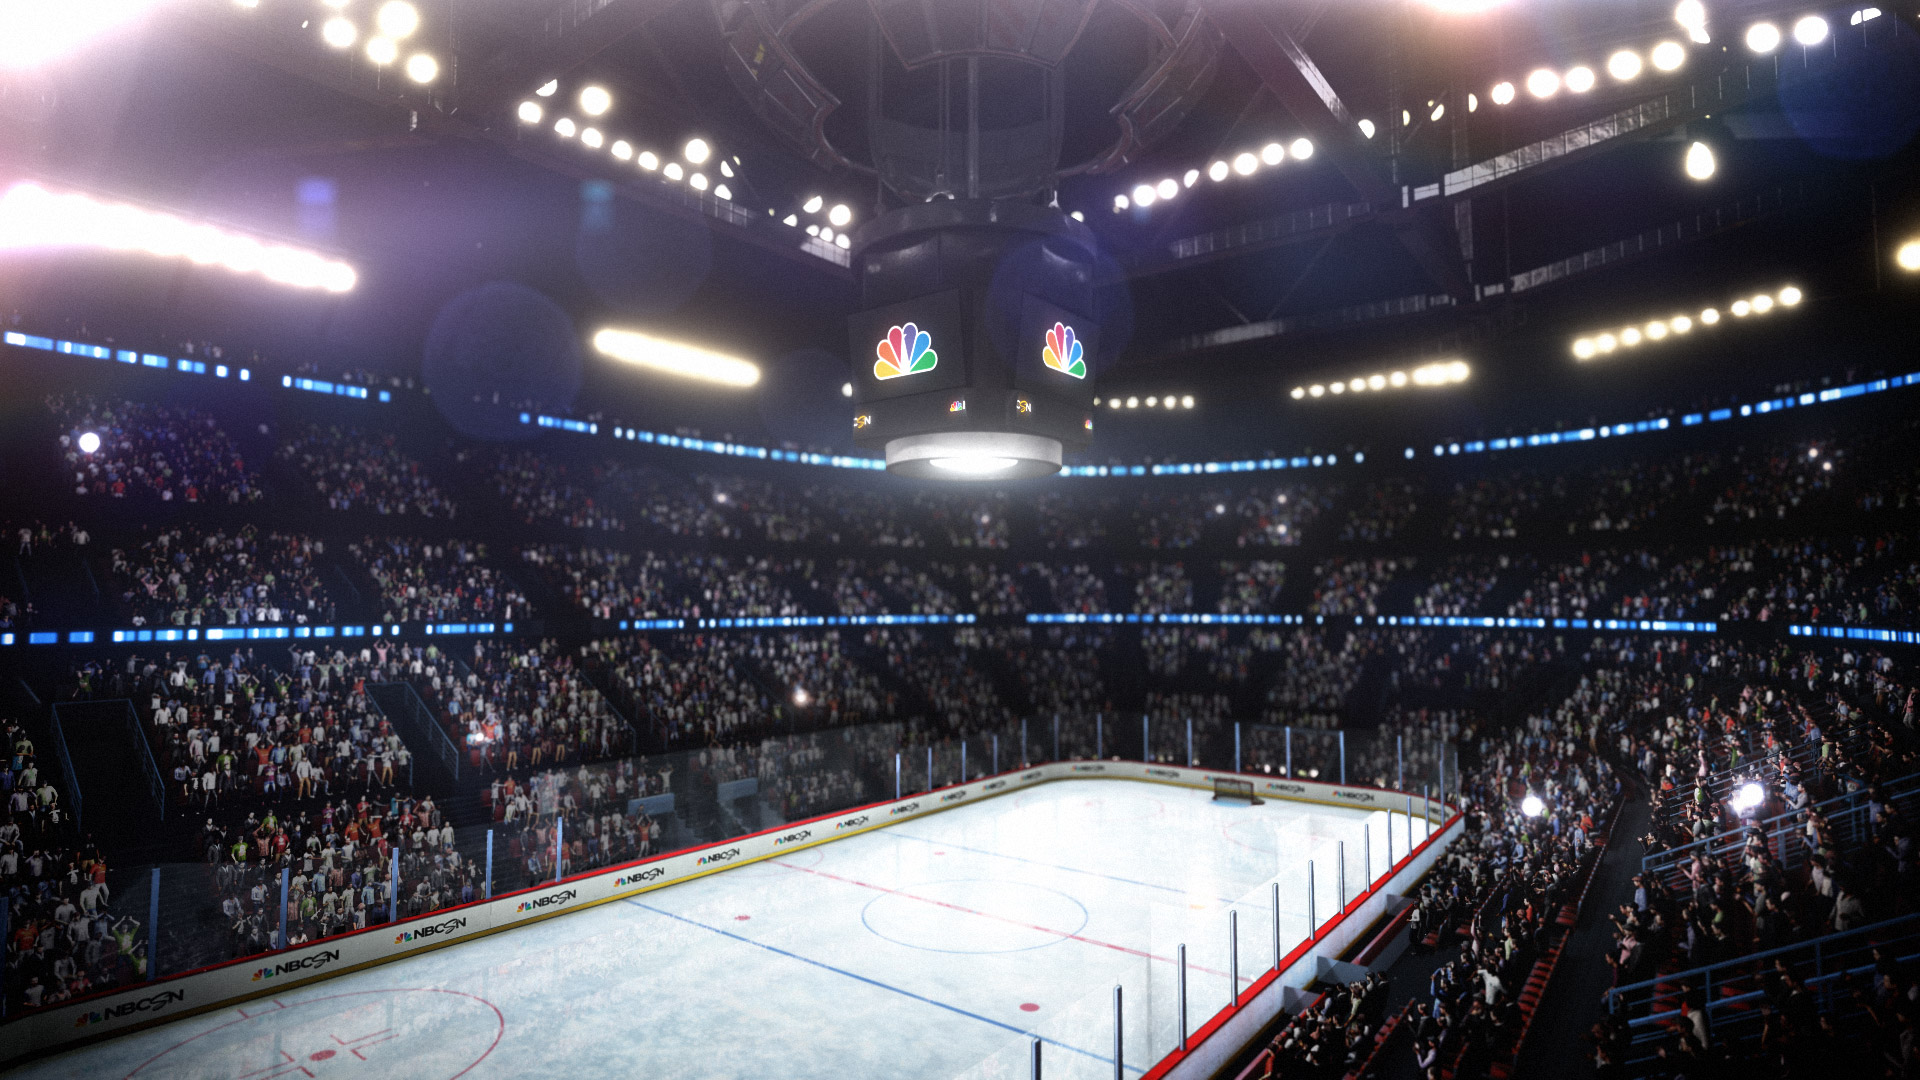 NBC_NHL_SPONS_B_RENDER_29.97 (00033).jpg